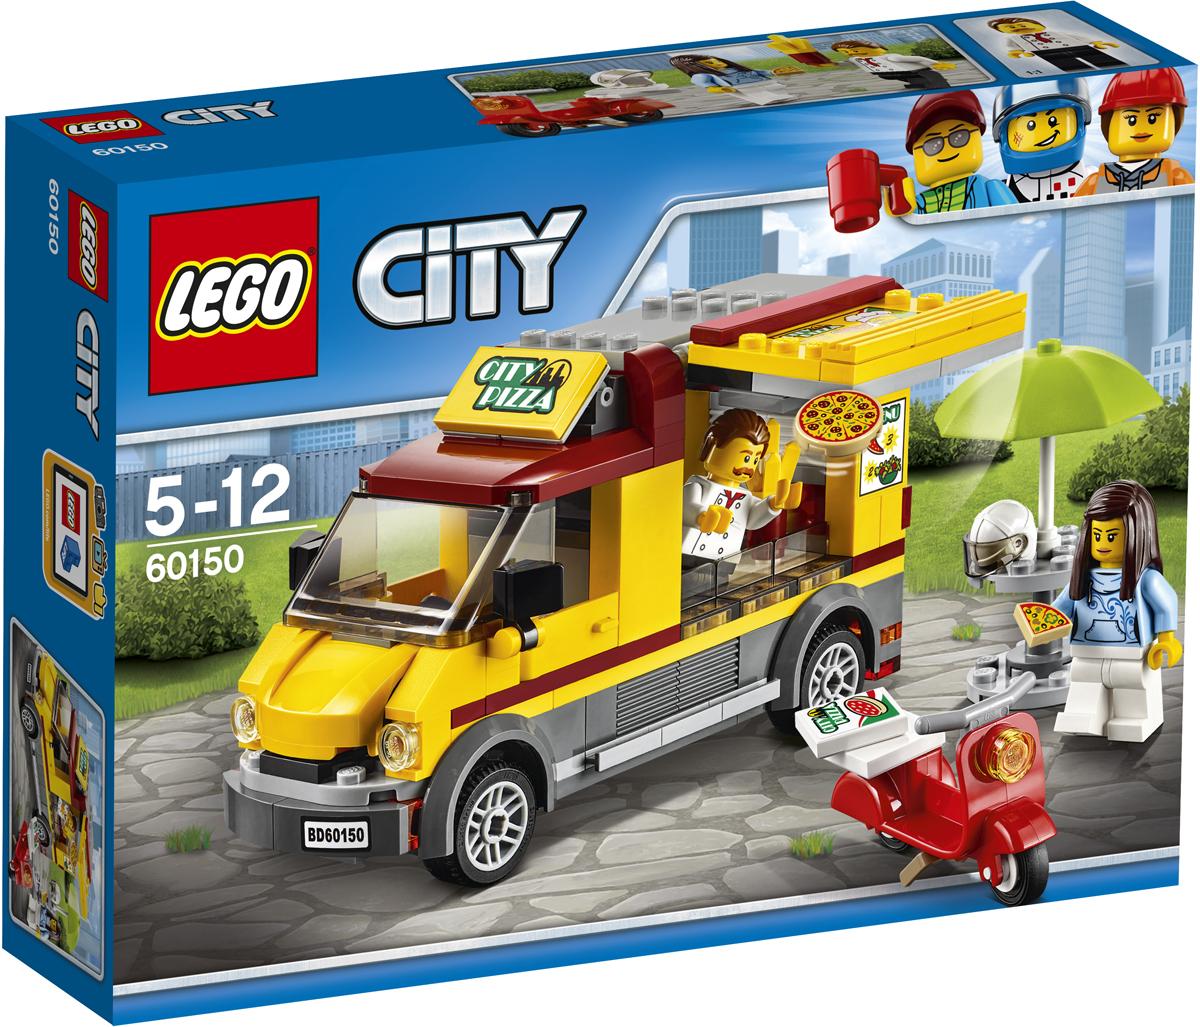 LEGO City Конструктор Фургон-пиццерия 60150